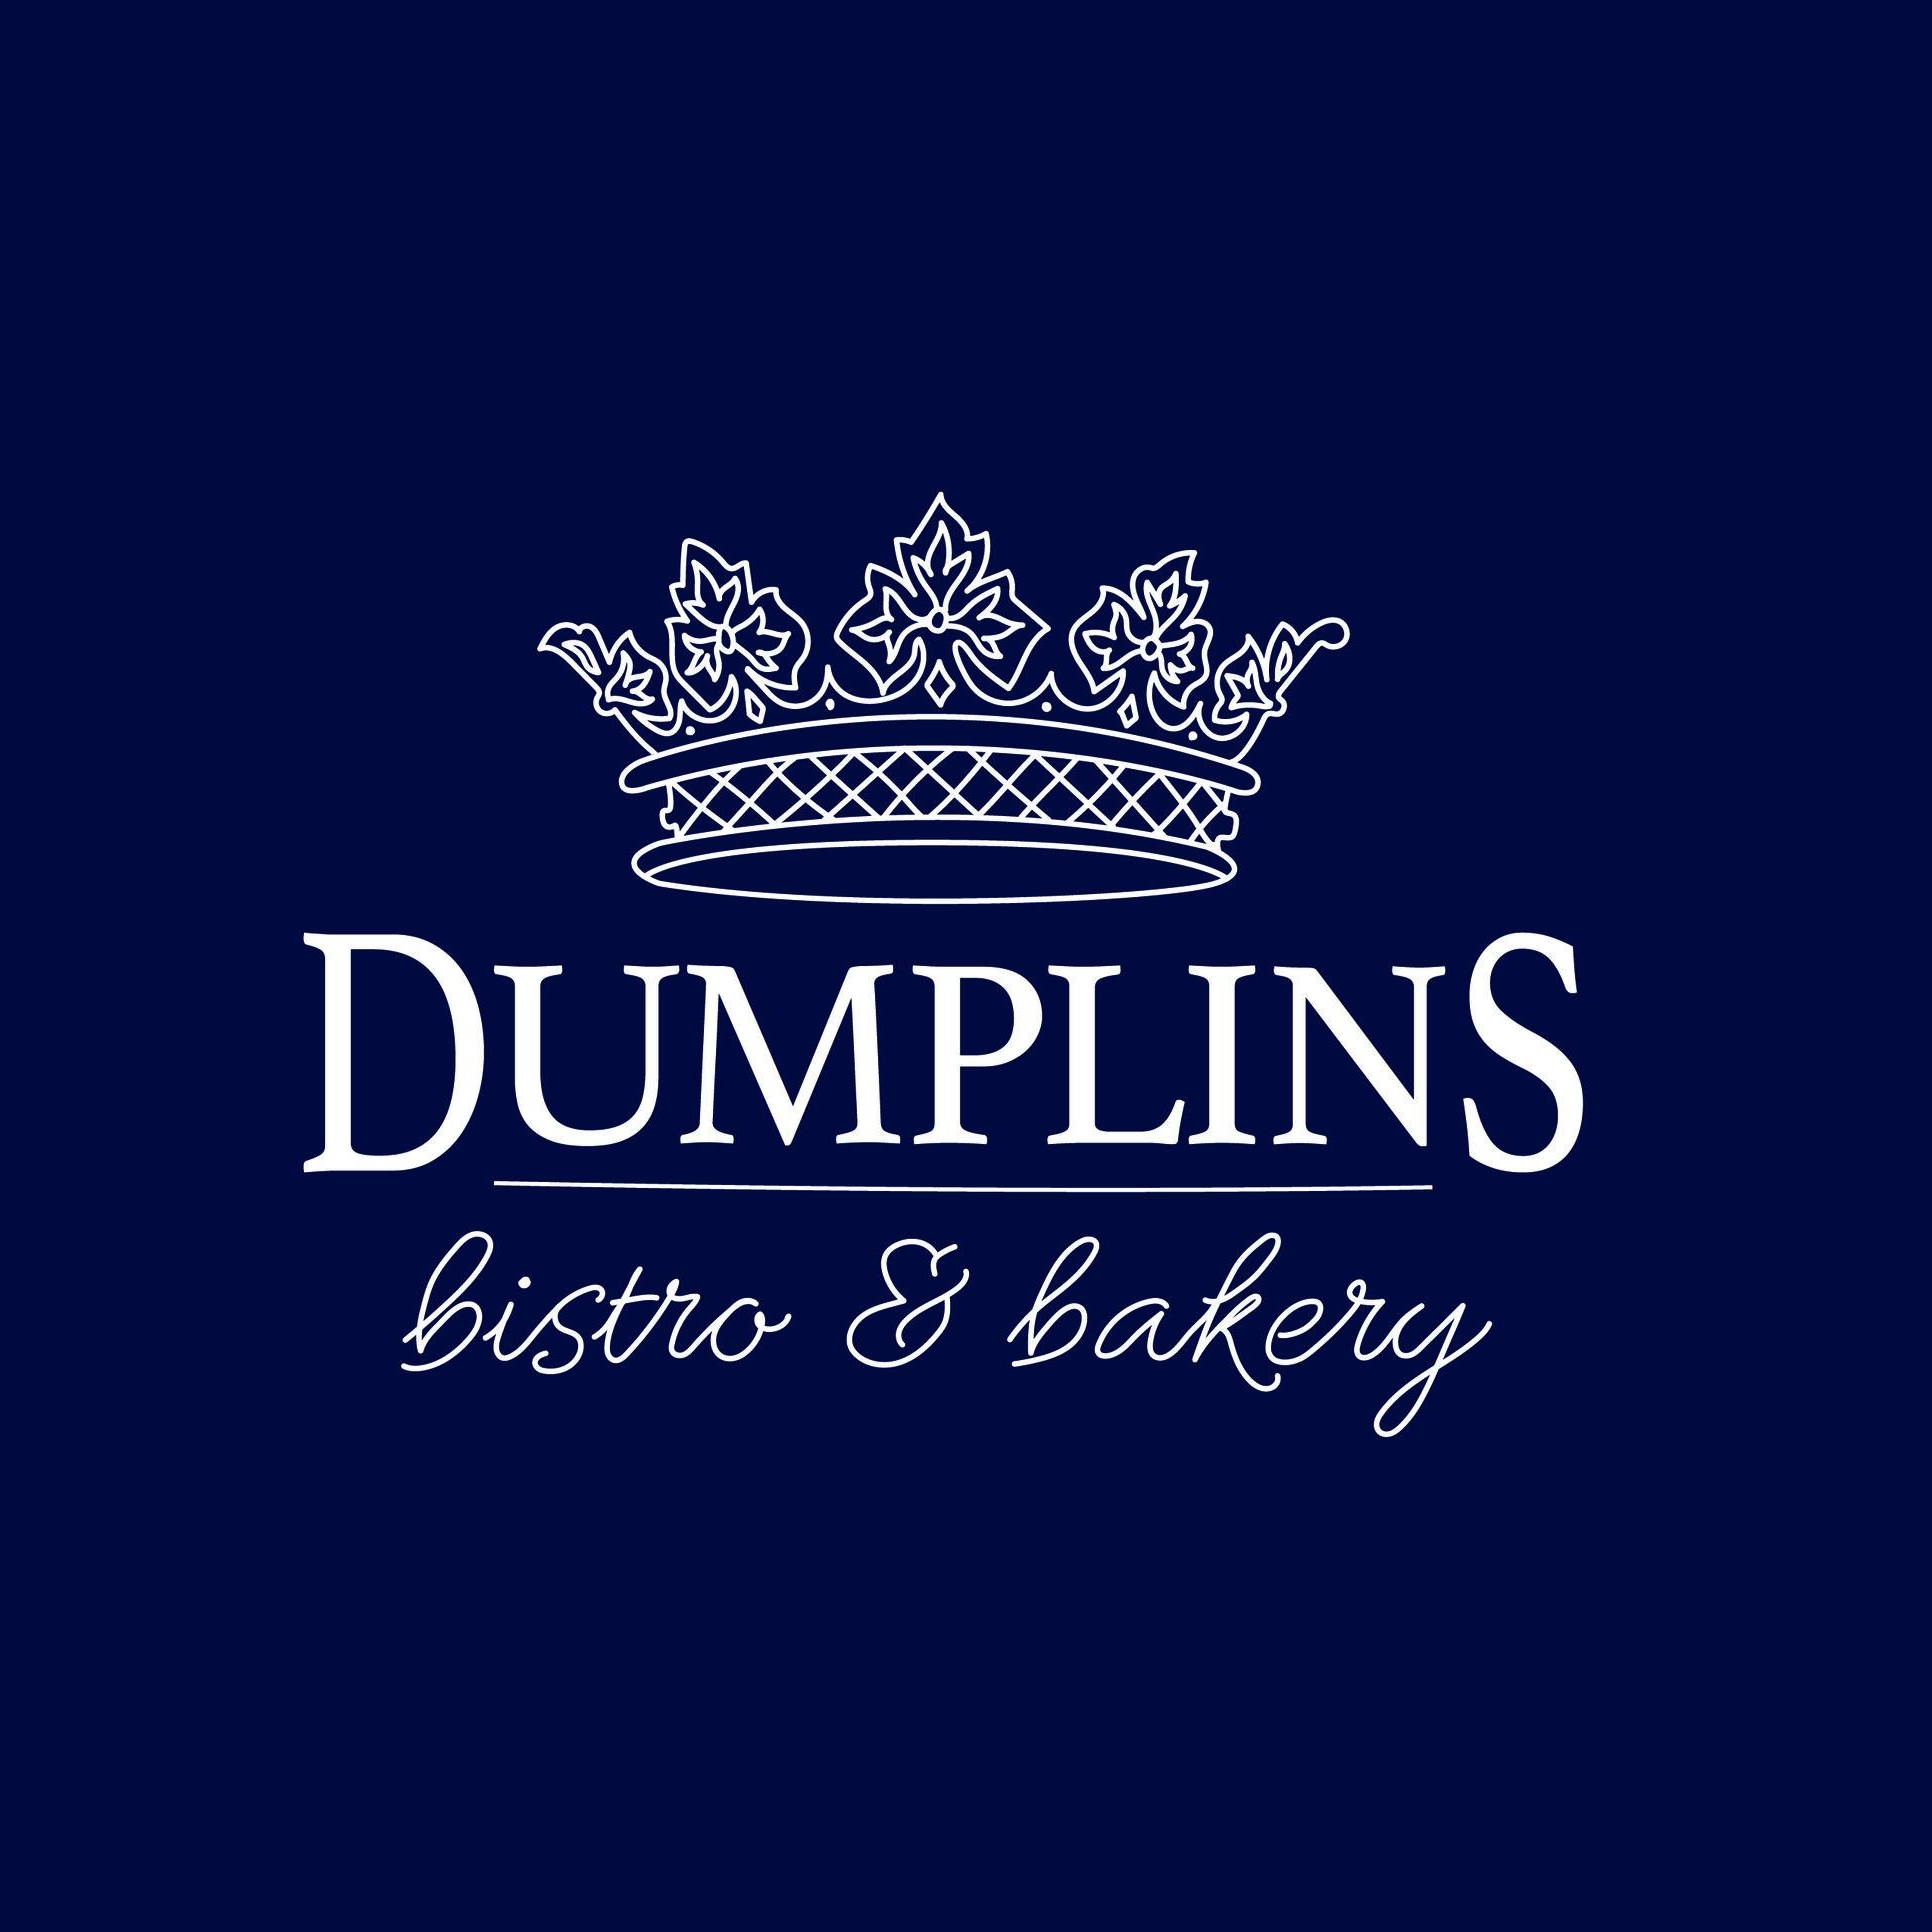 Dumplins Restaurant Branding Package